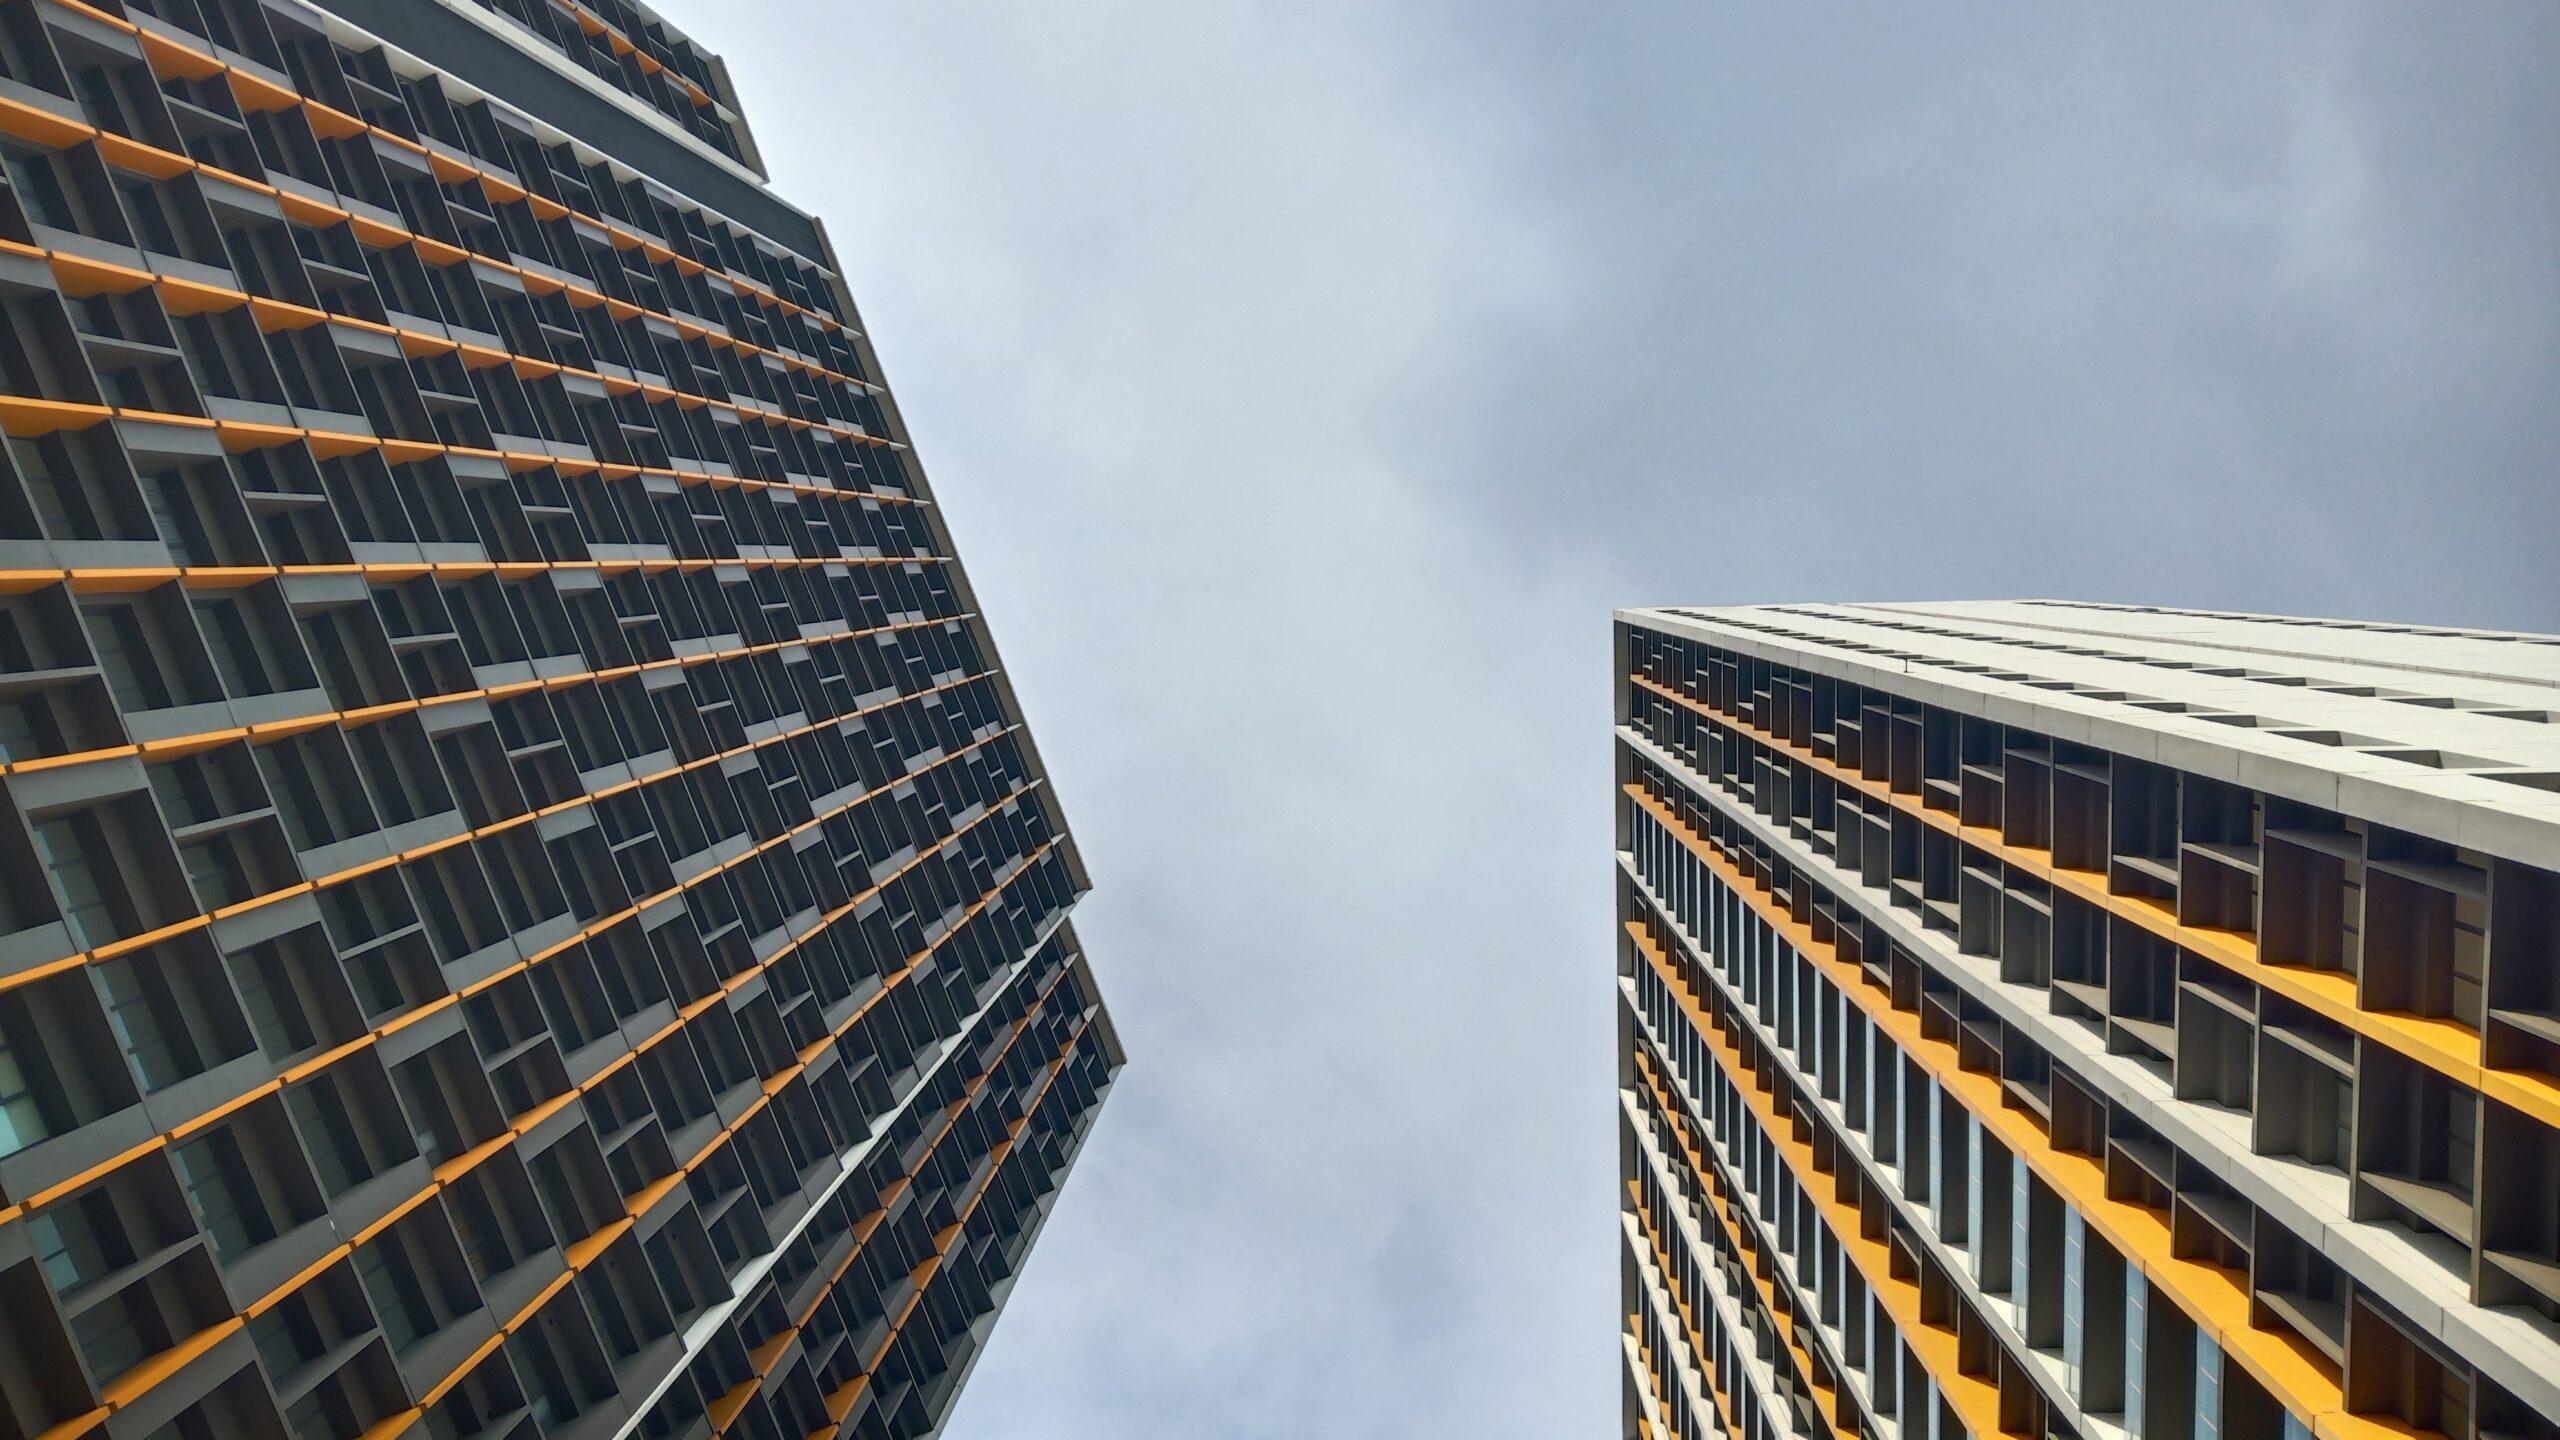 Izzara Apartment terdiri dari 2 tower hunian yang merangkum 523 unit